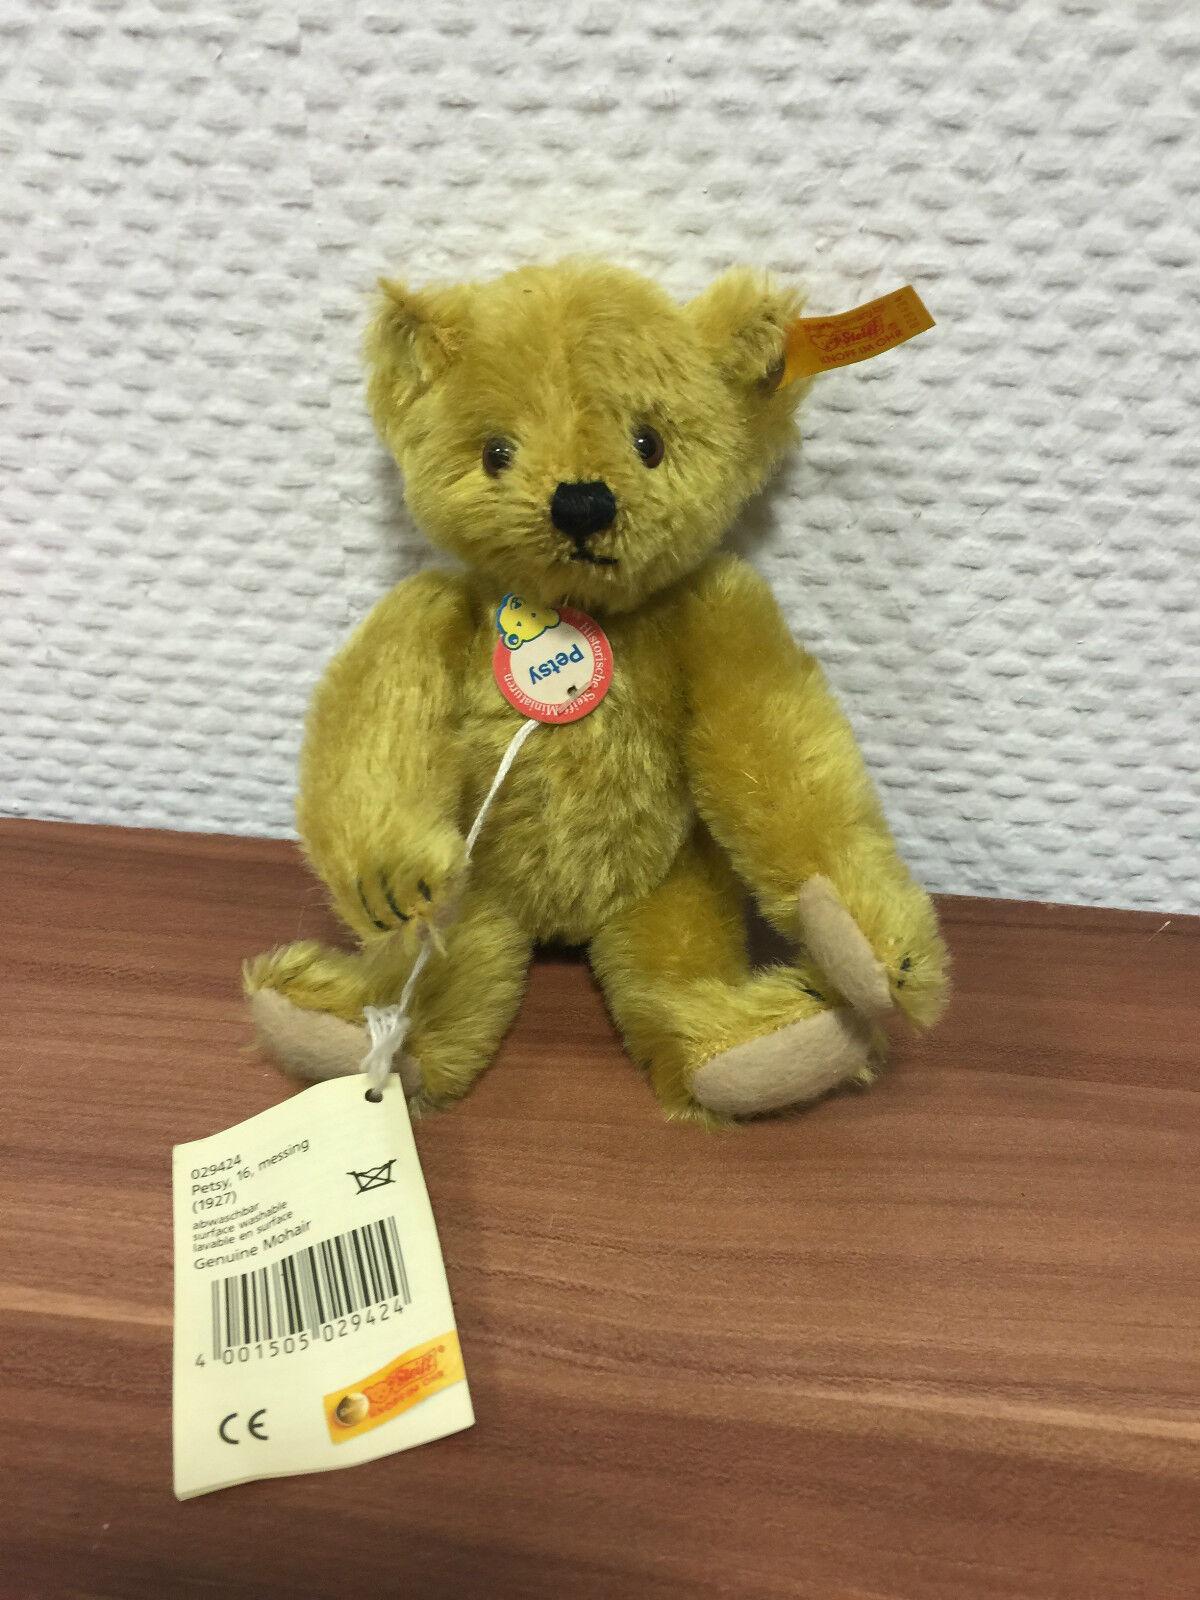 Steiff Teddy Bear 029424 Petsy 16 Cm. Top Condition